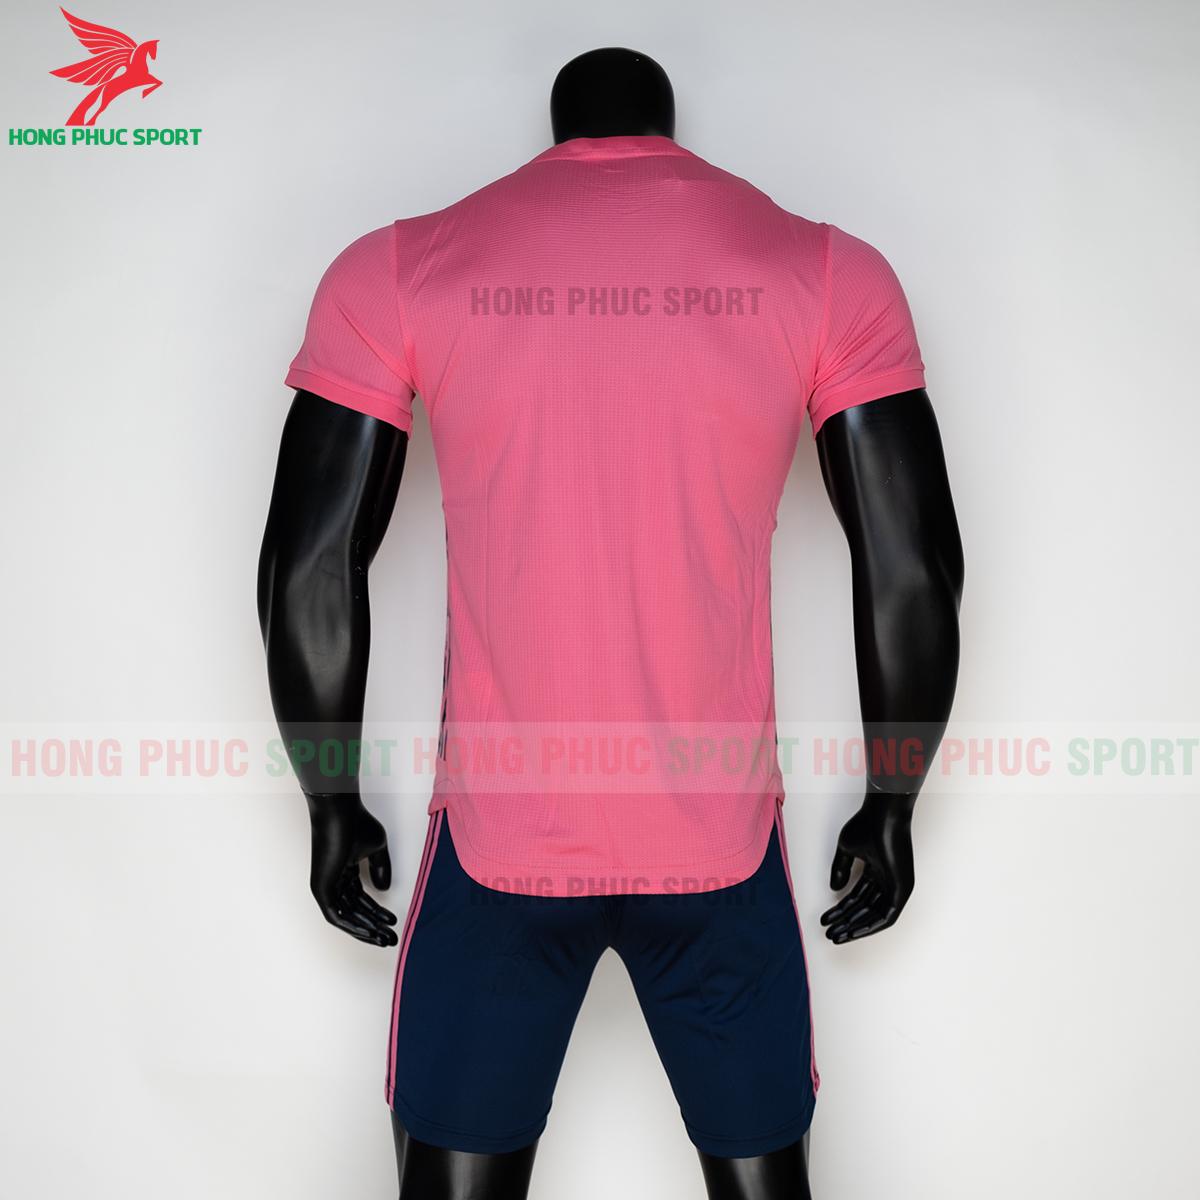 https://cdn.hongphucsport.com/unsafe/s4.shopbay.vn/files/285/ao-real-madrid-2020-san-khach-7-5f72f784591a4.png